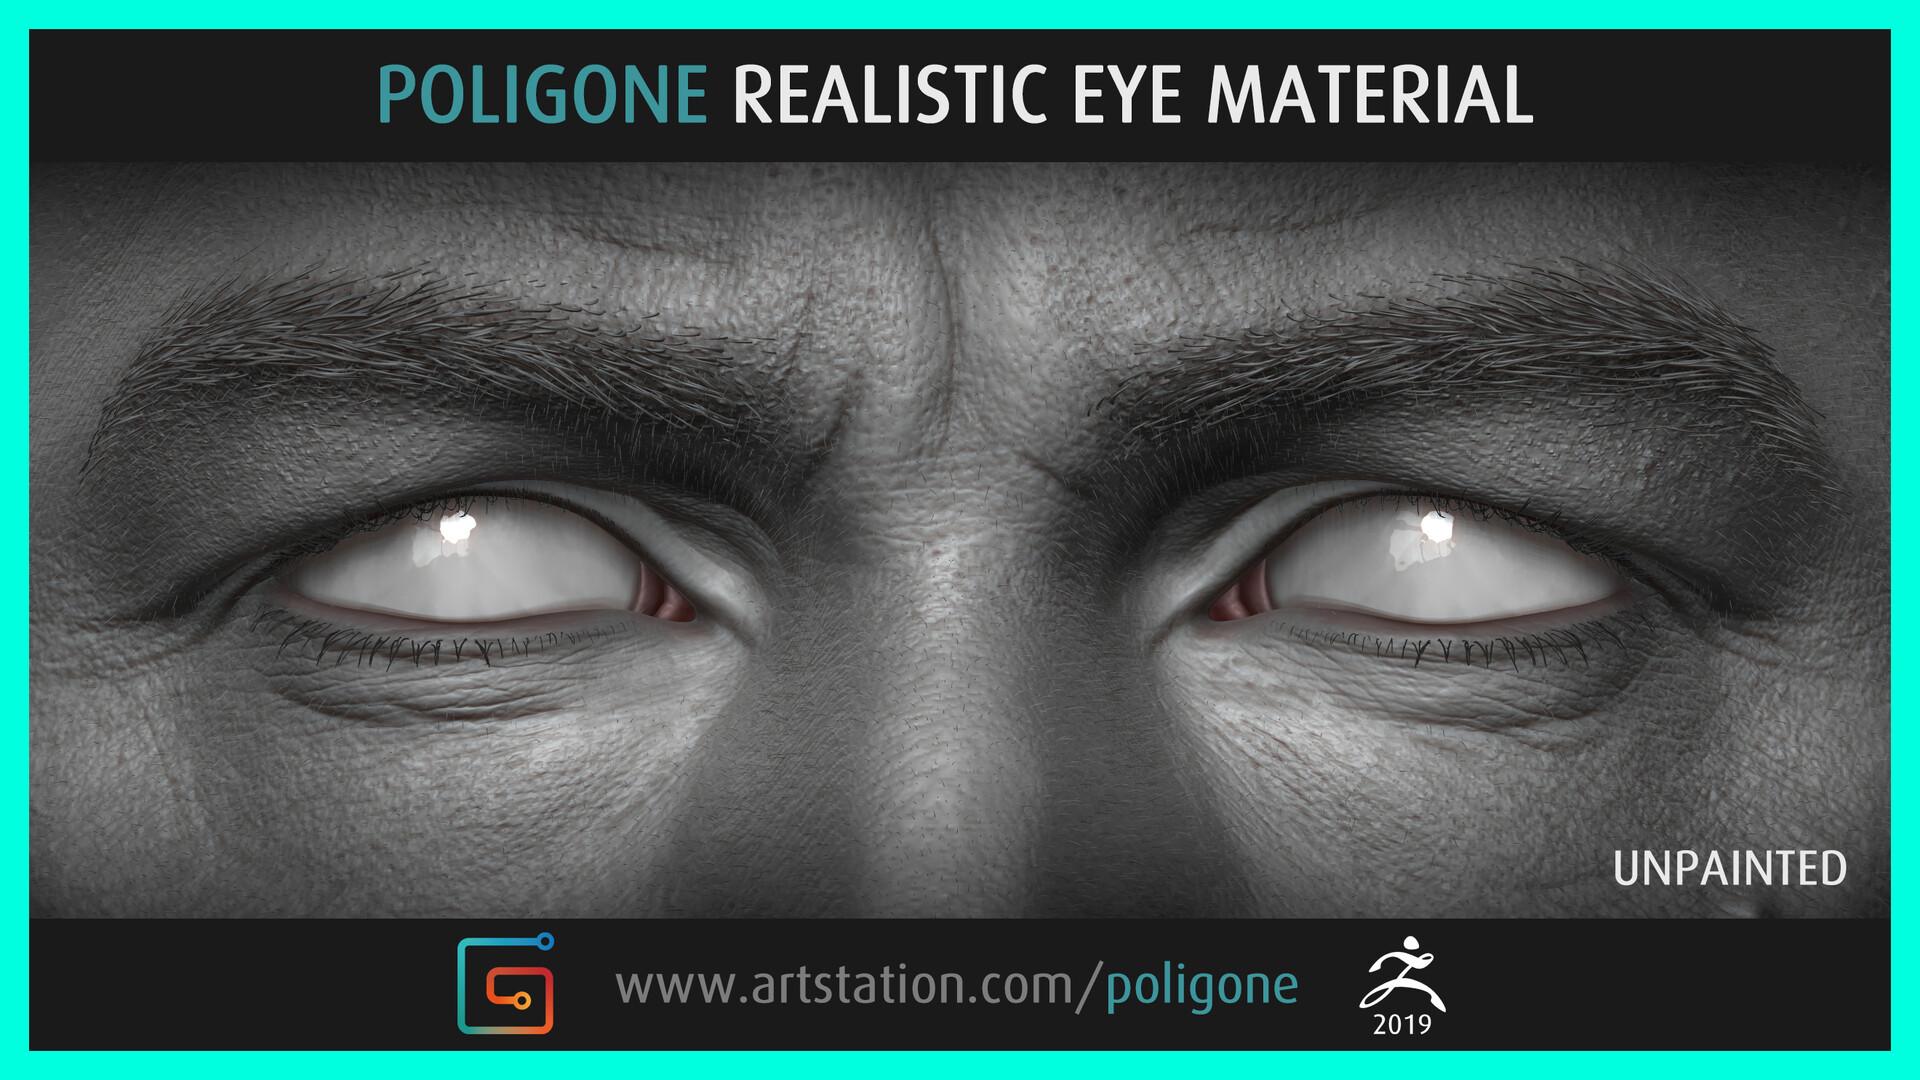 Poligone cg 2